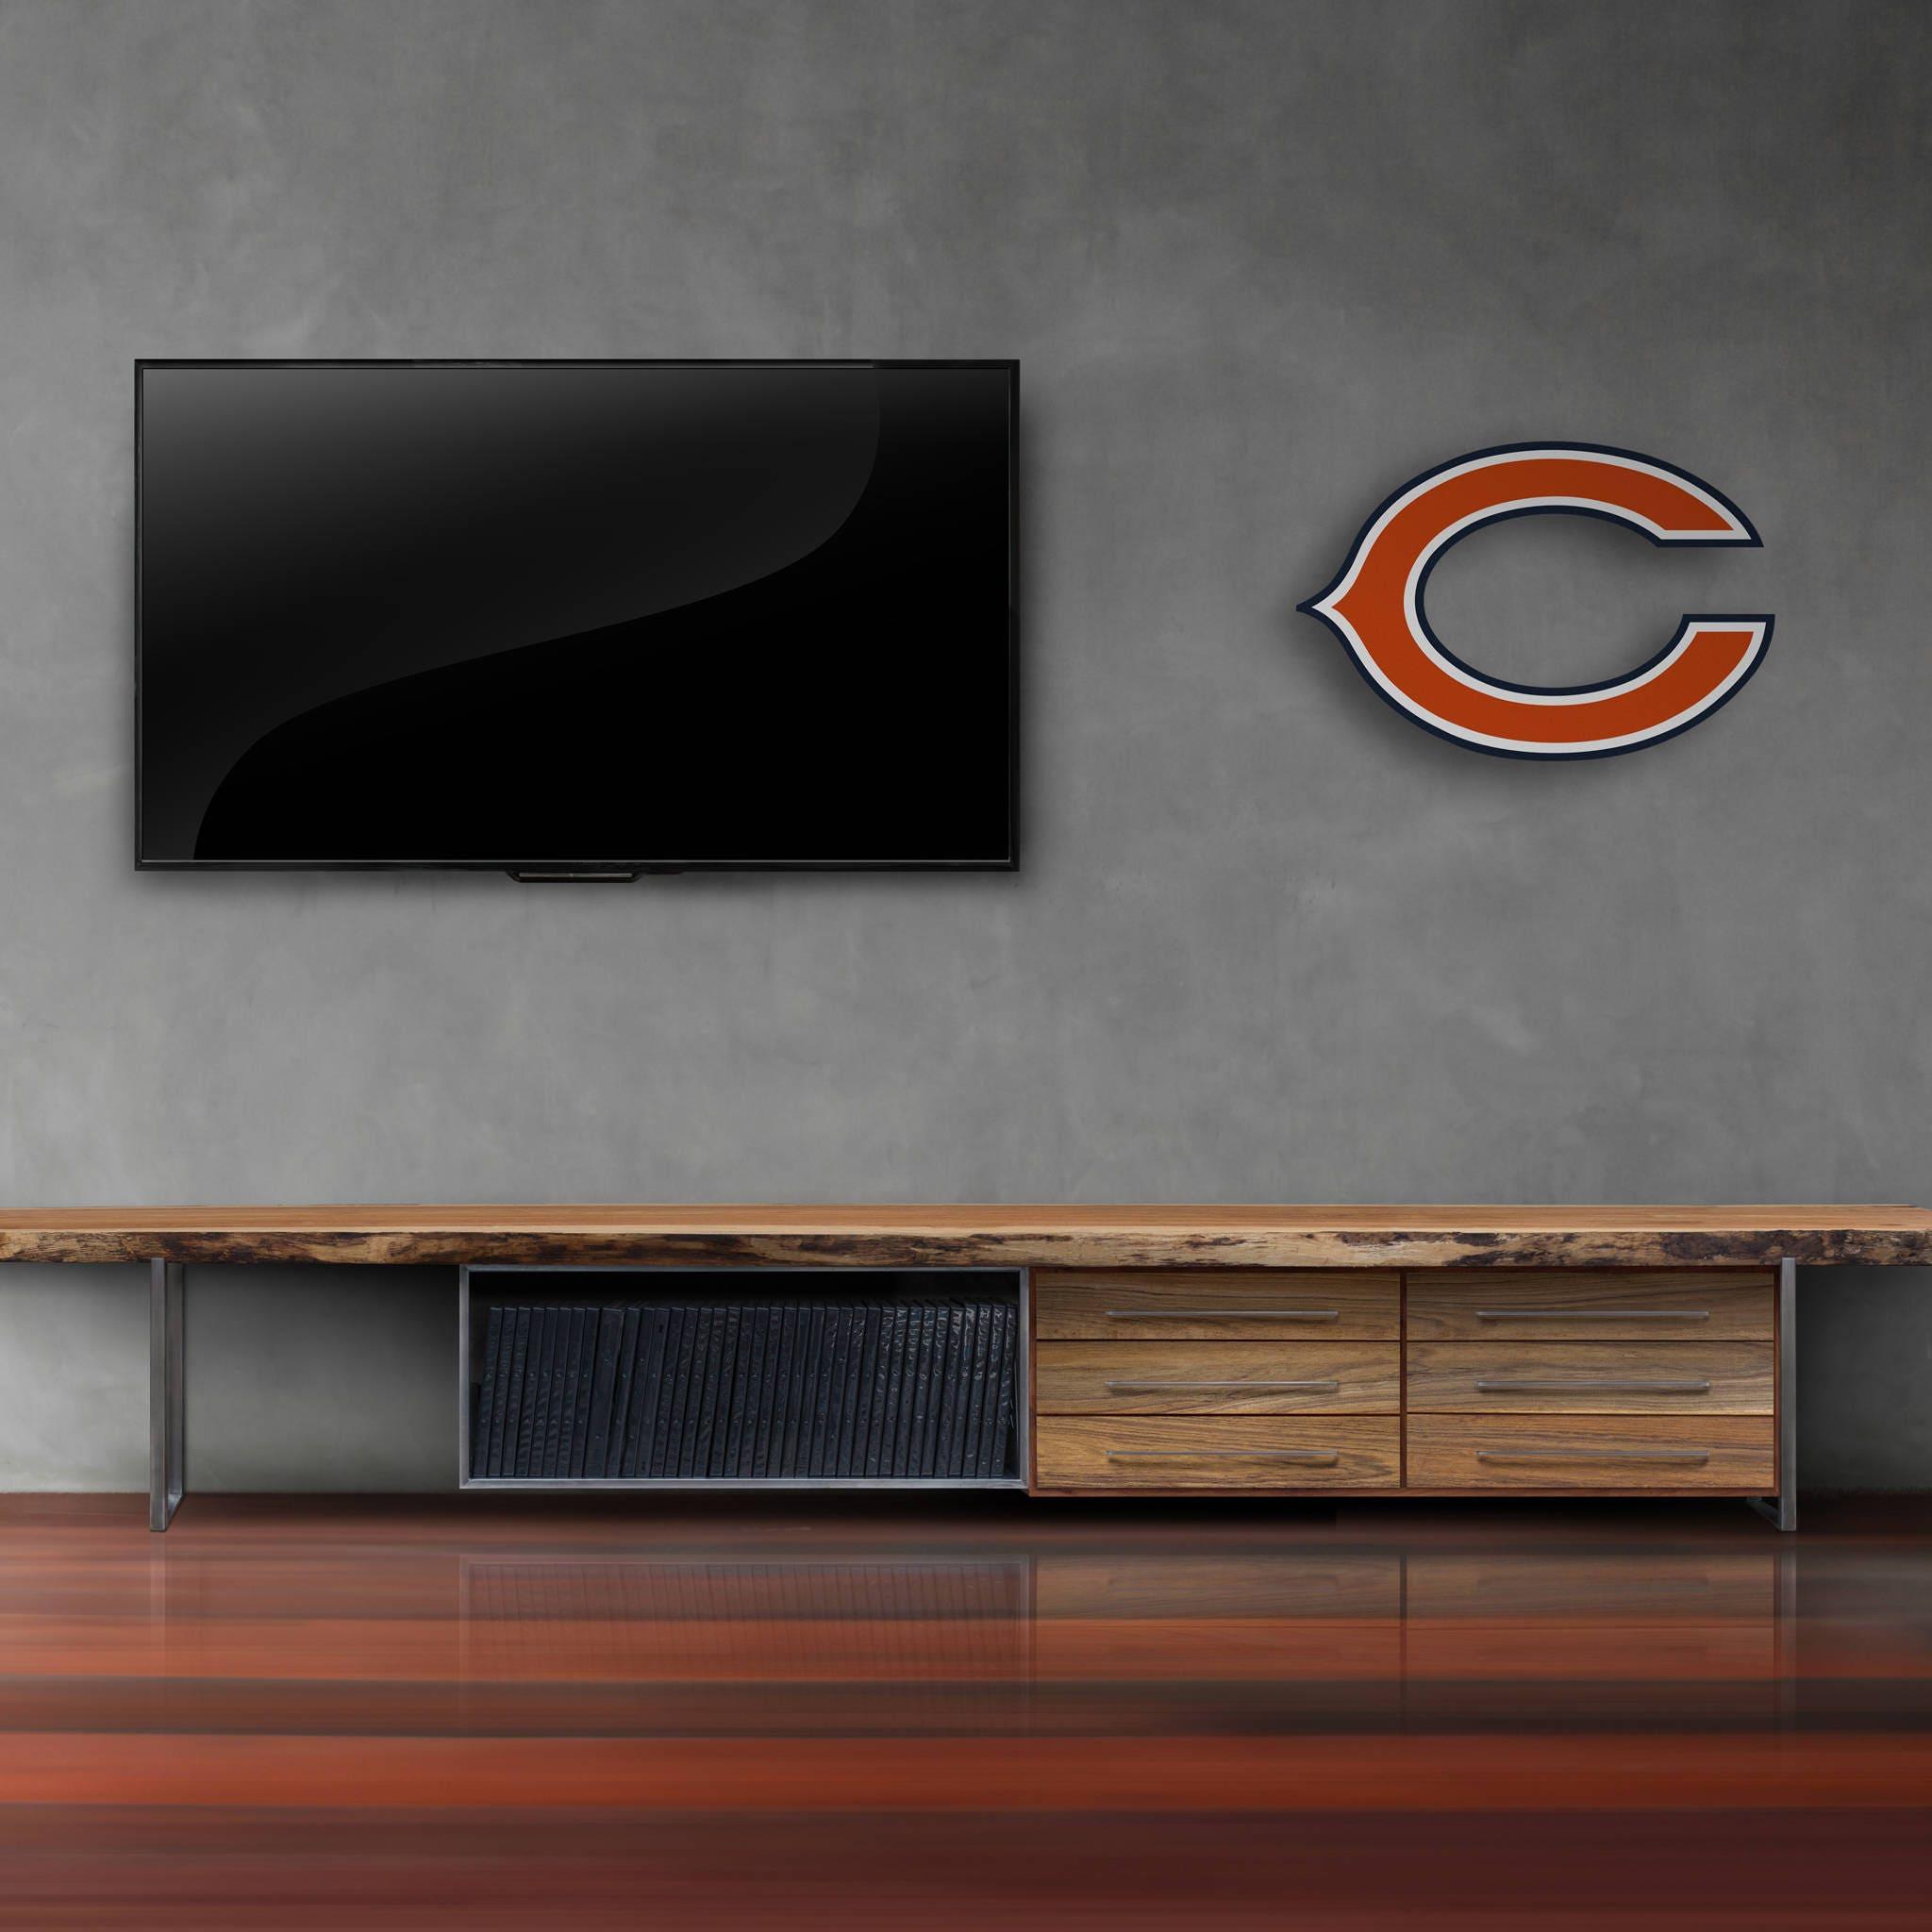 Chicago Bears Decor|Wall Decor|Boy Room Decor|Boy Football Decor|Teen